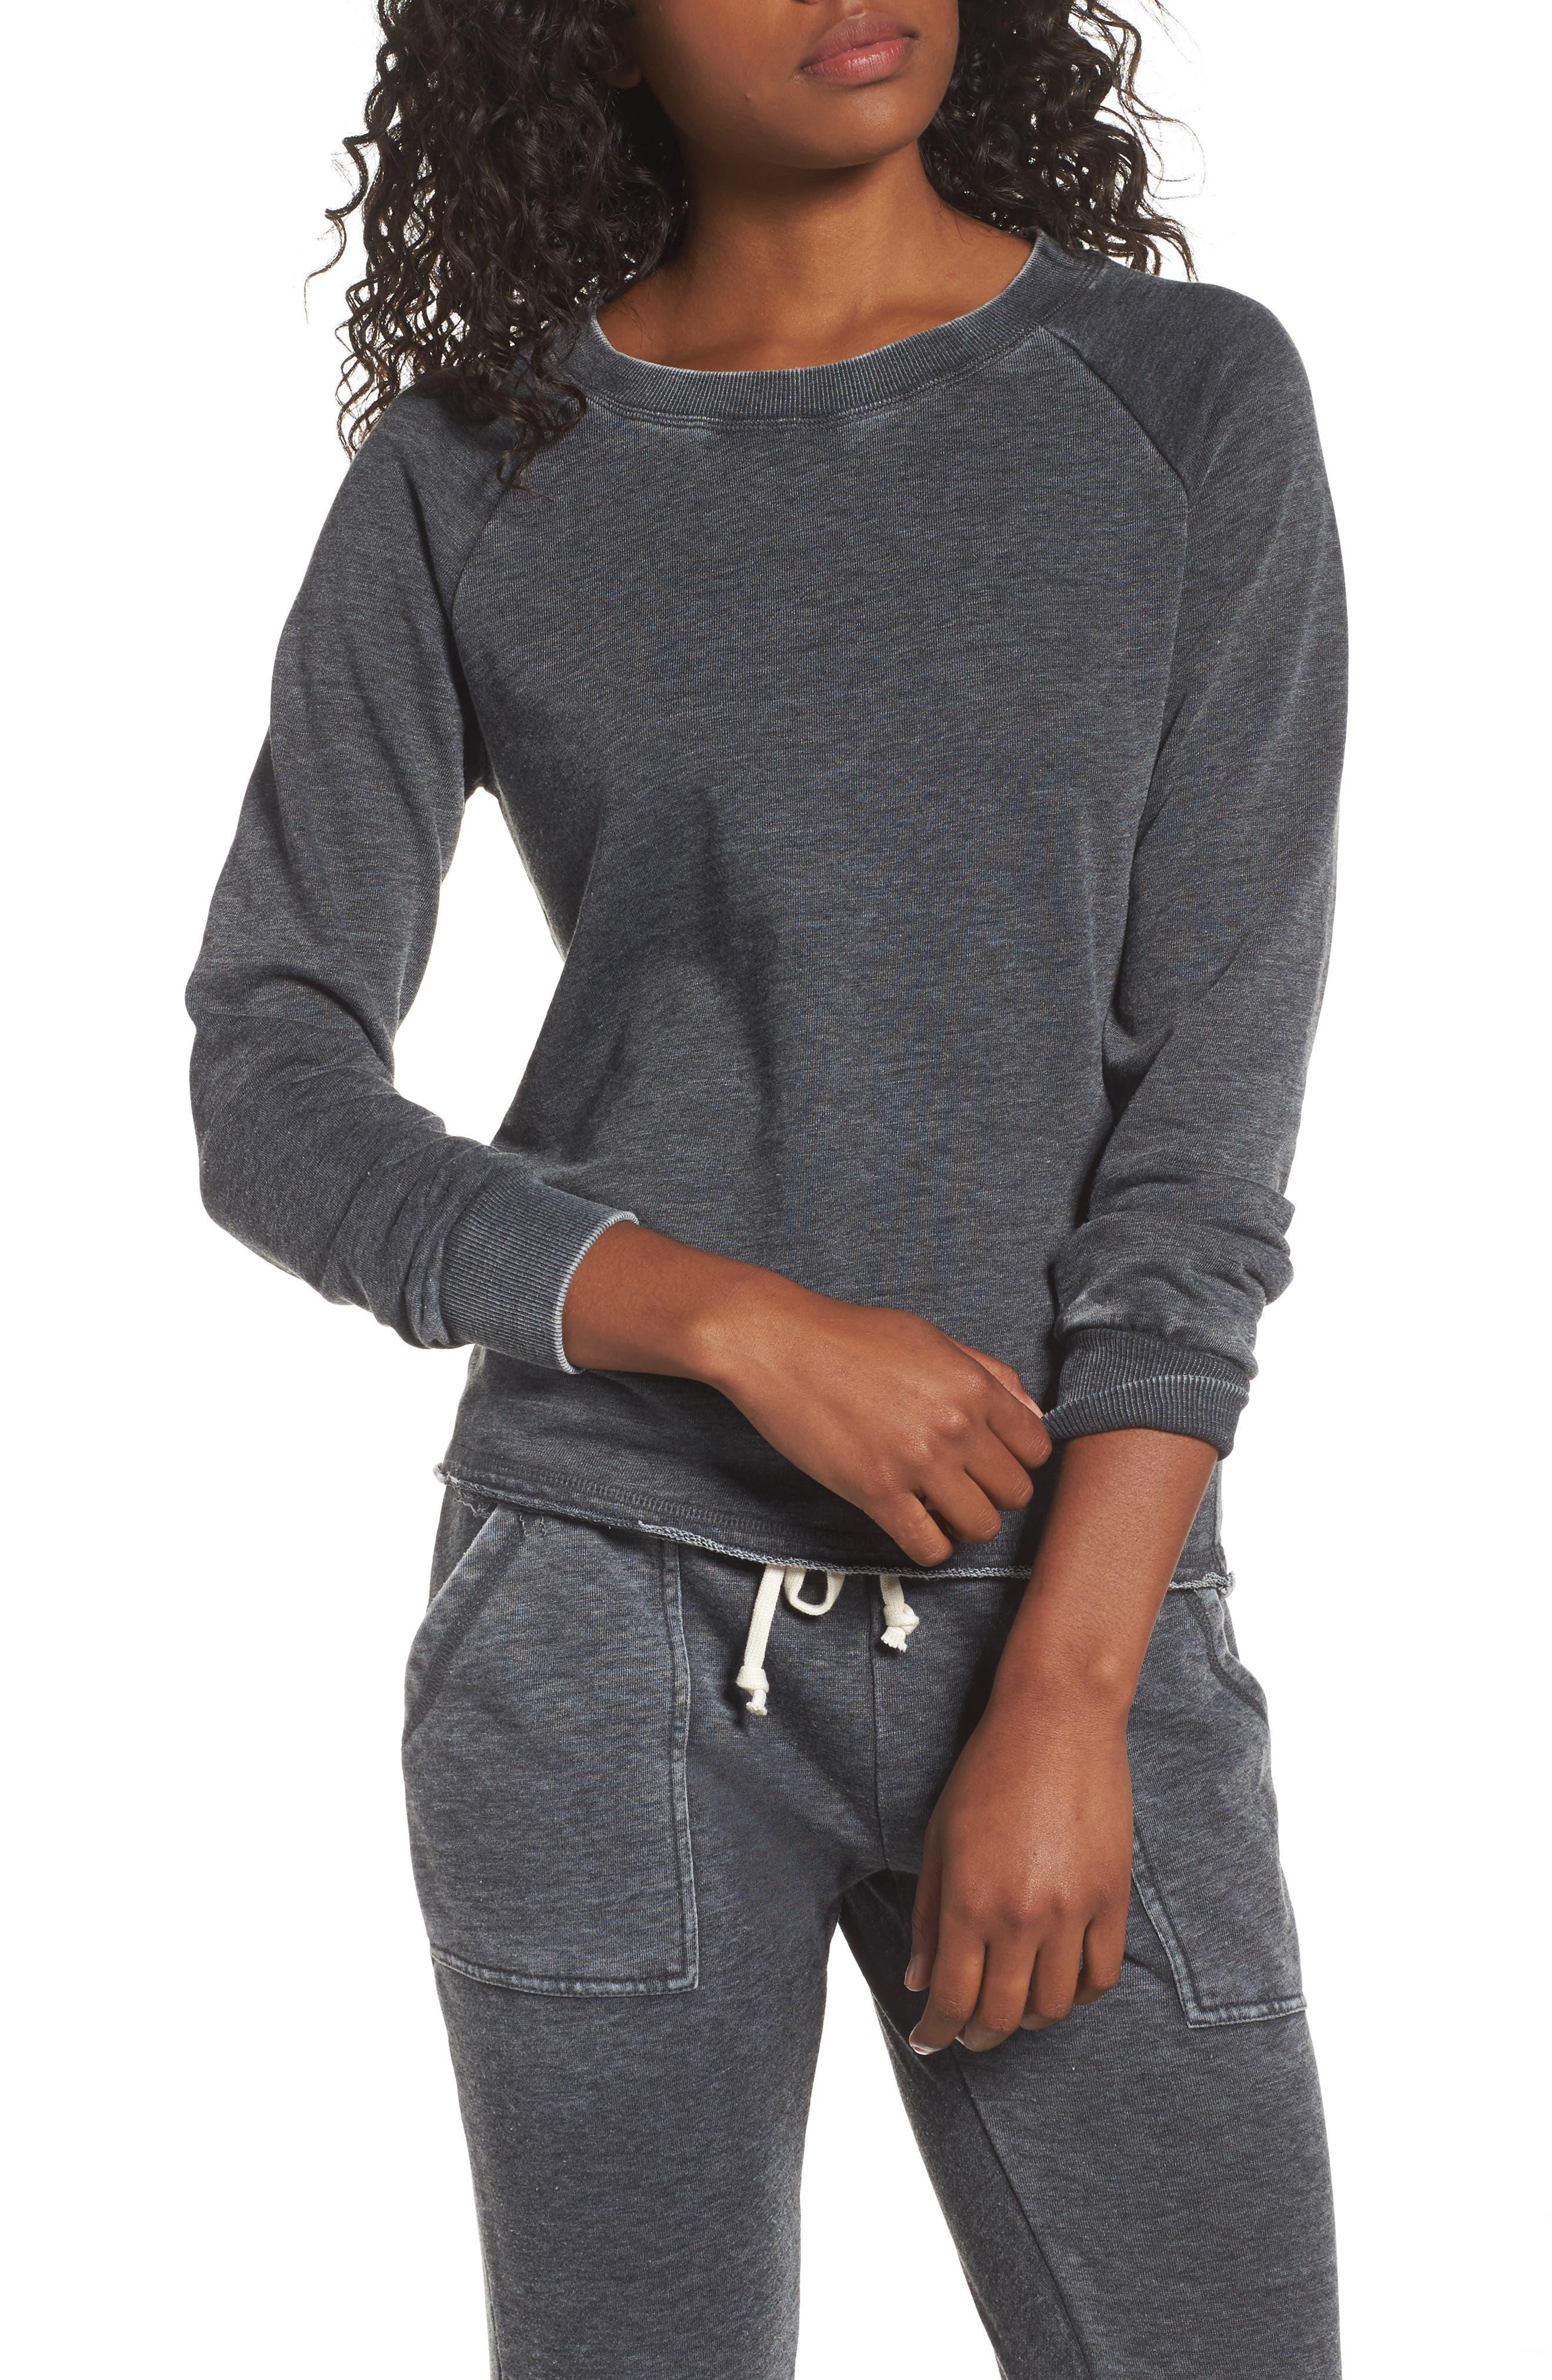 Alternative Lazy Day Pullover